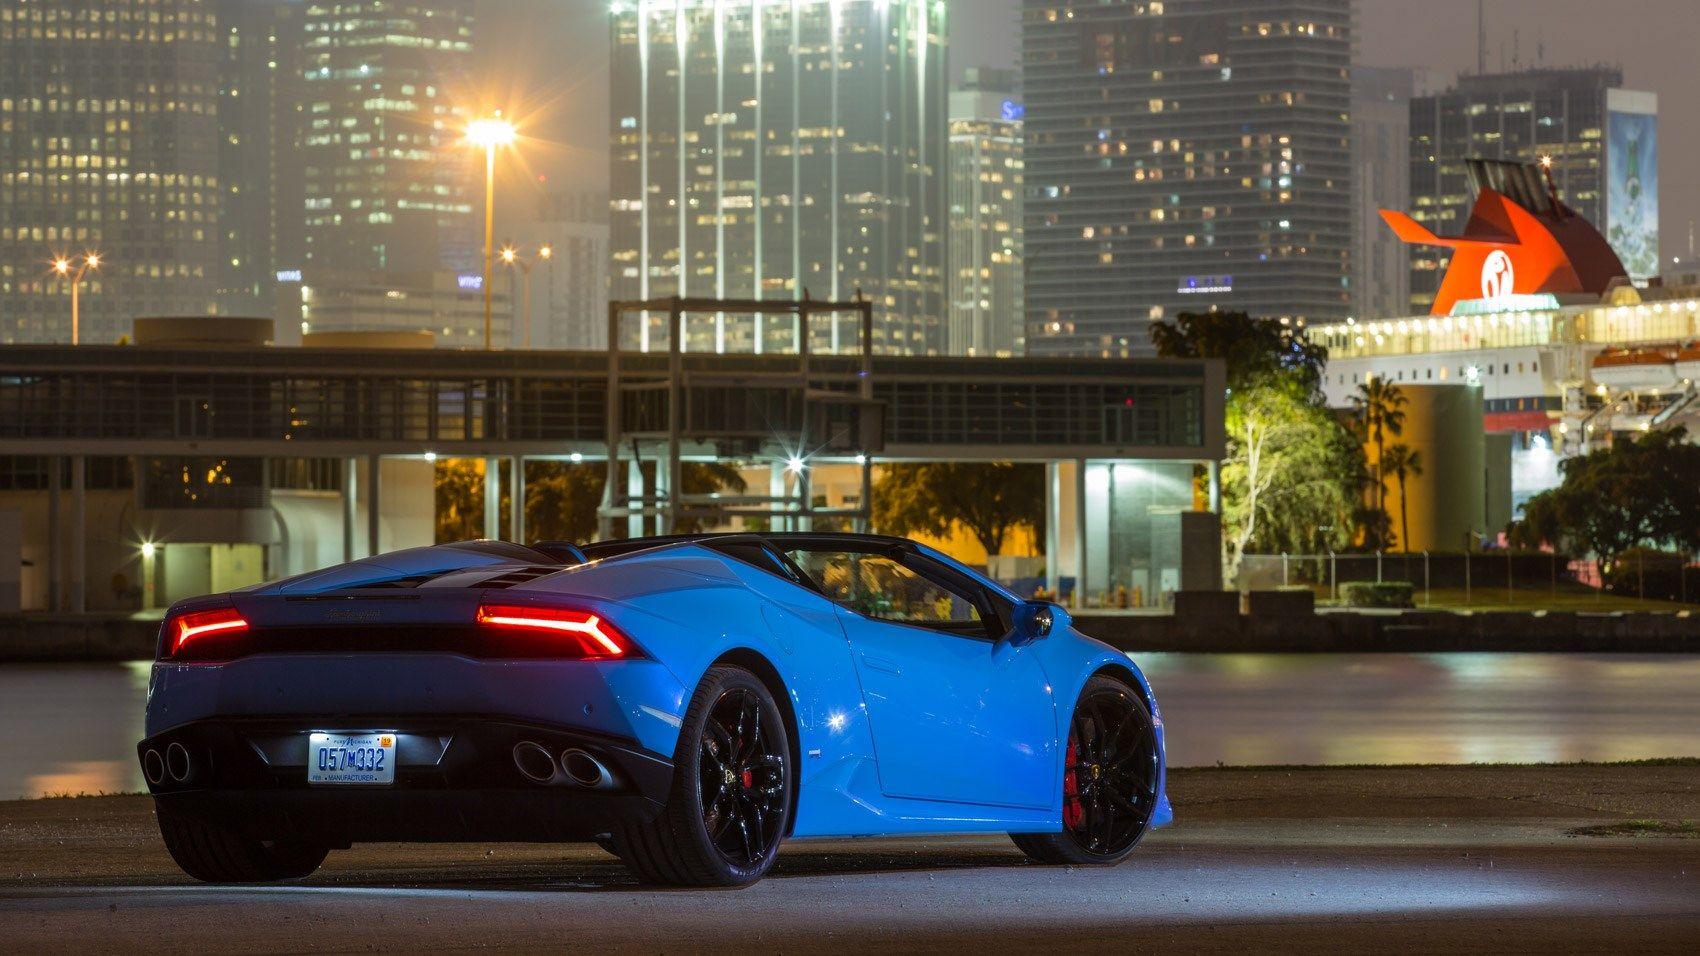 Lamborghini Huracan LP610 4 Spyder (2016) Review By CAR Magazine